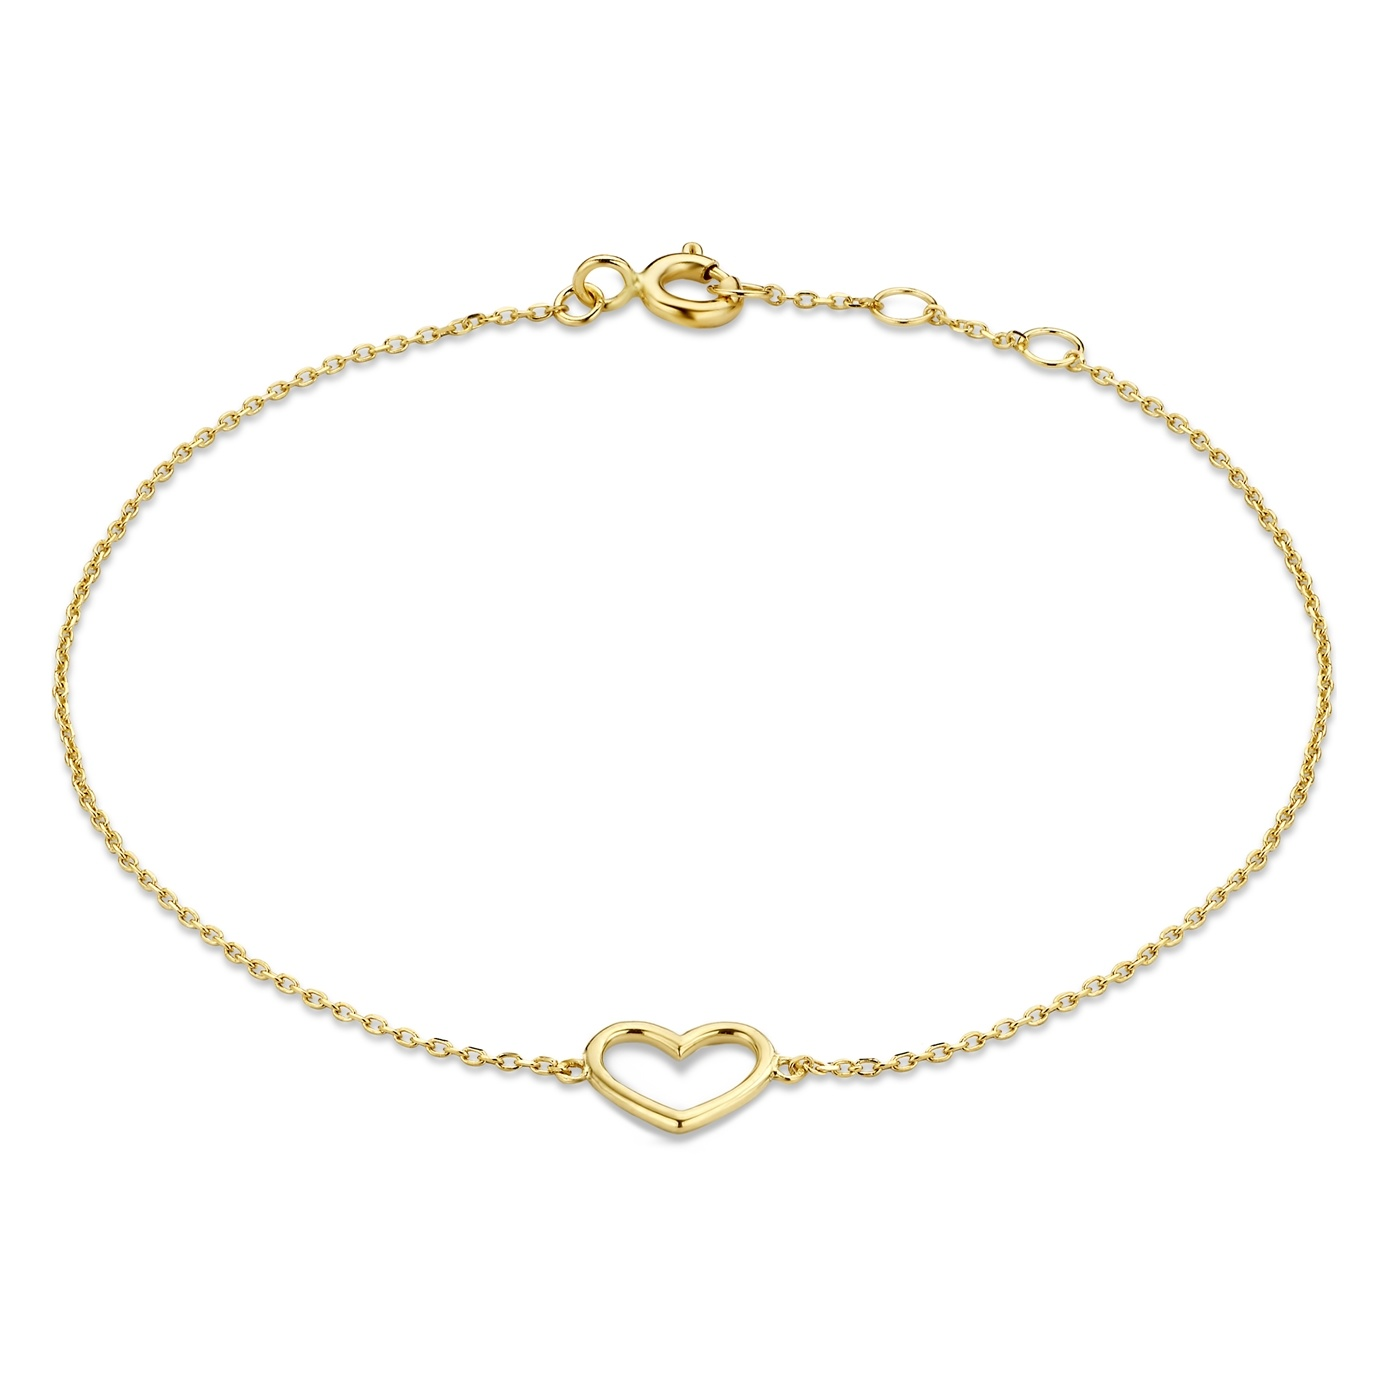 Isabel Bernard Belleville Amore 14 karaat gouden armband met hartje